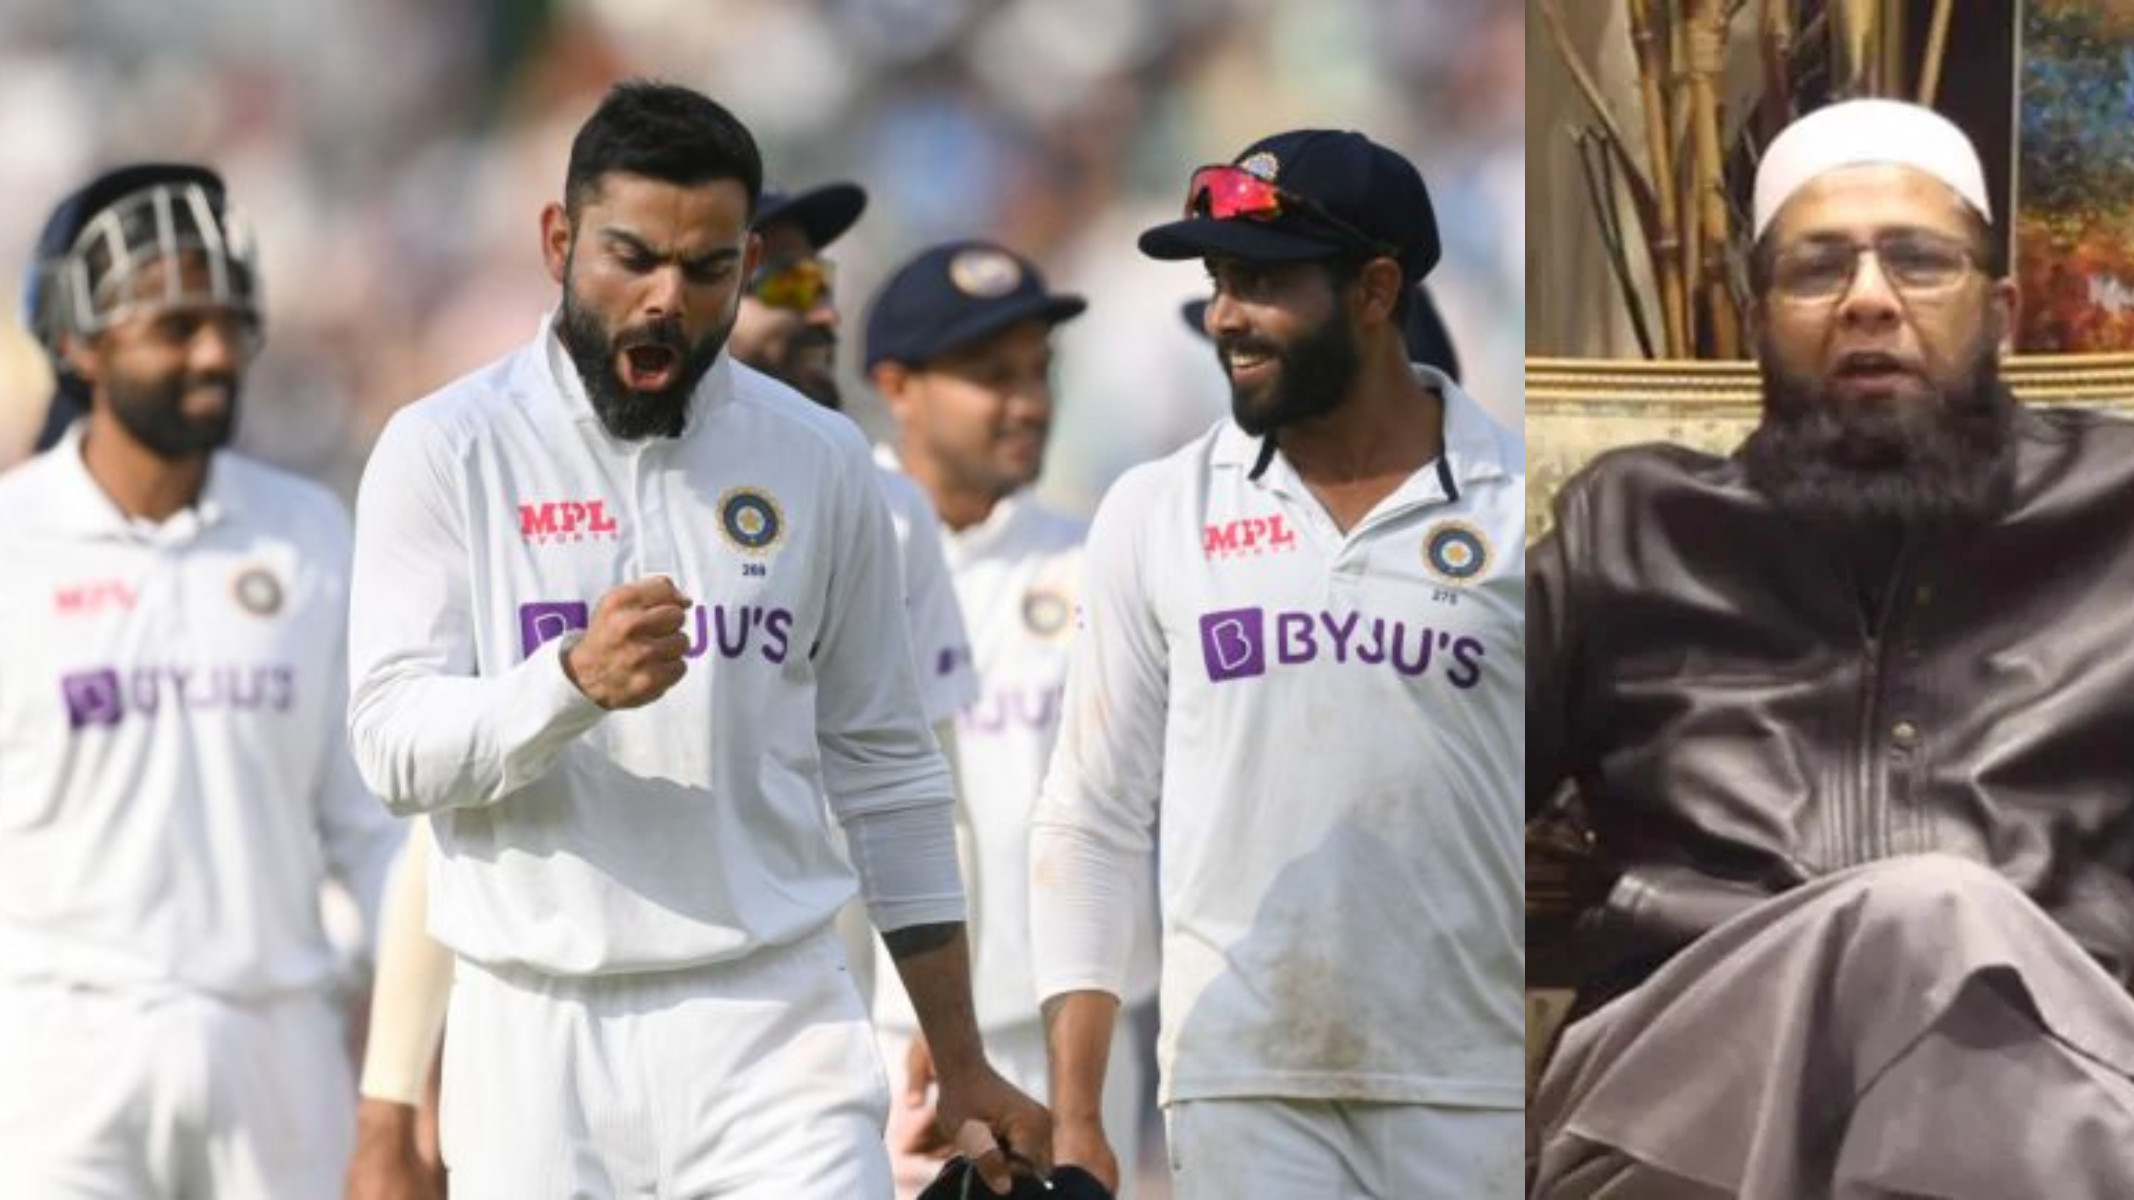 ENG v IND 2021: Inzamam says credit to Indian team for the comeback; praises Kohli's leadership